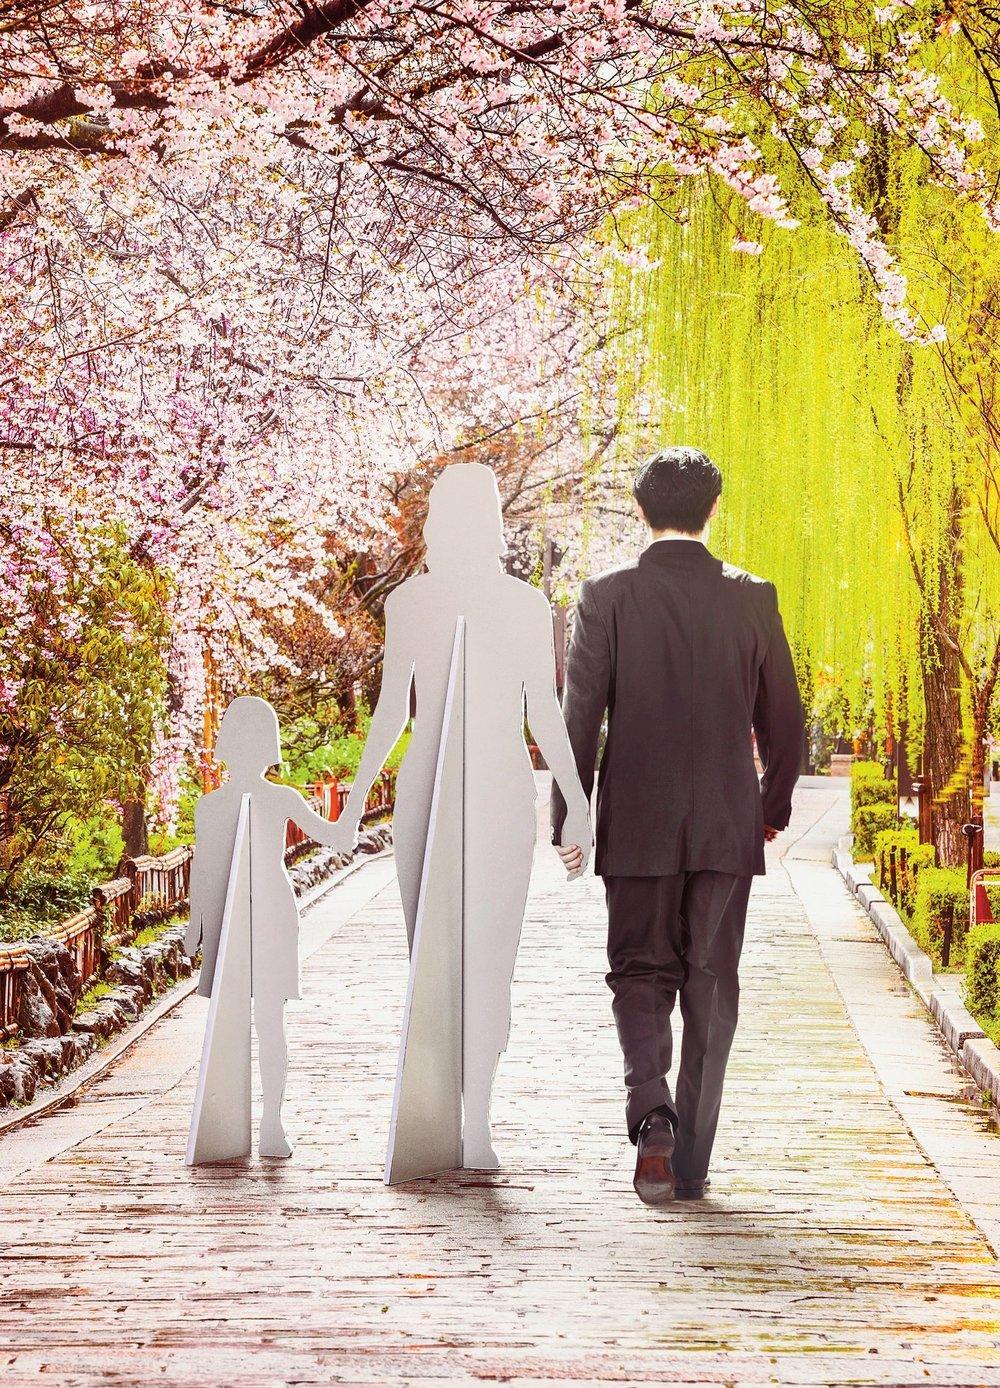 Bonus (article): Japan's Rent-a-Family Industry by Elif Batuman